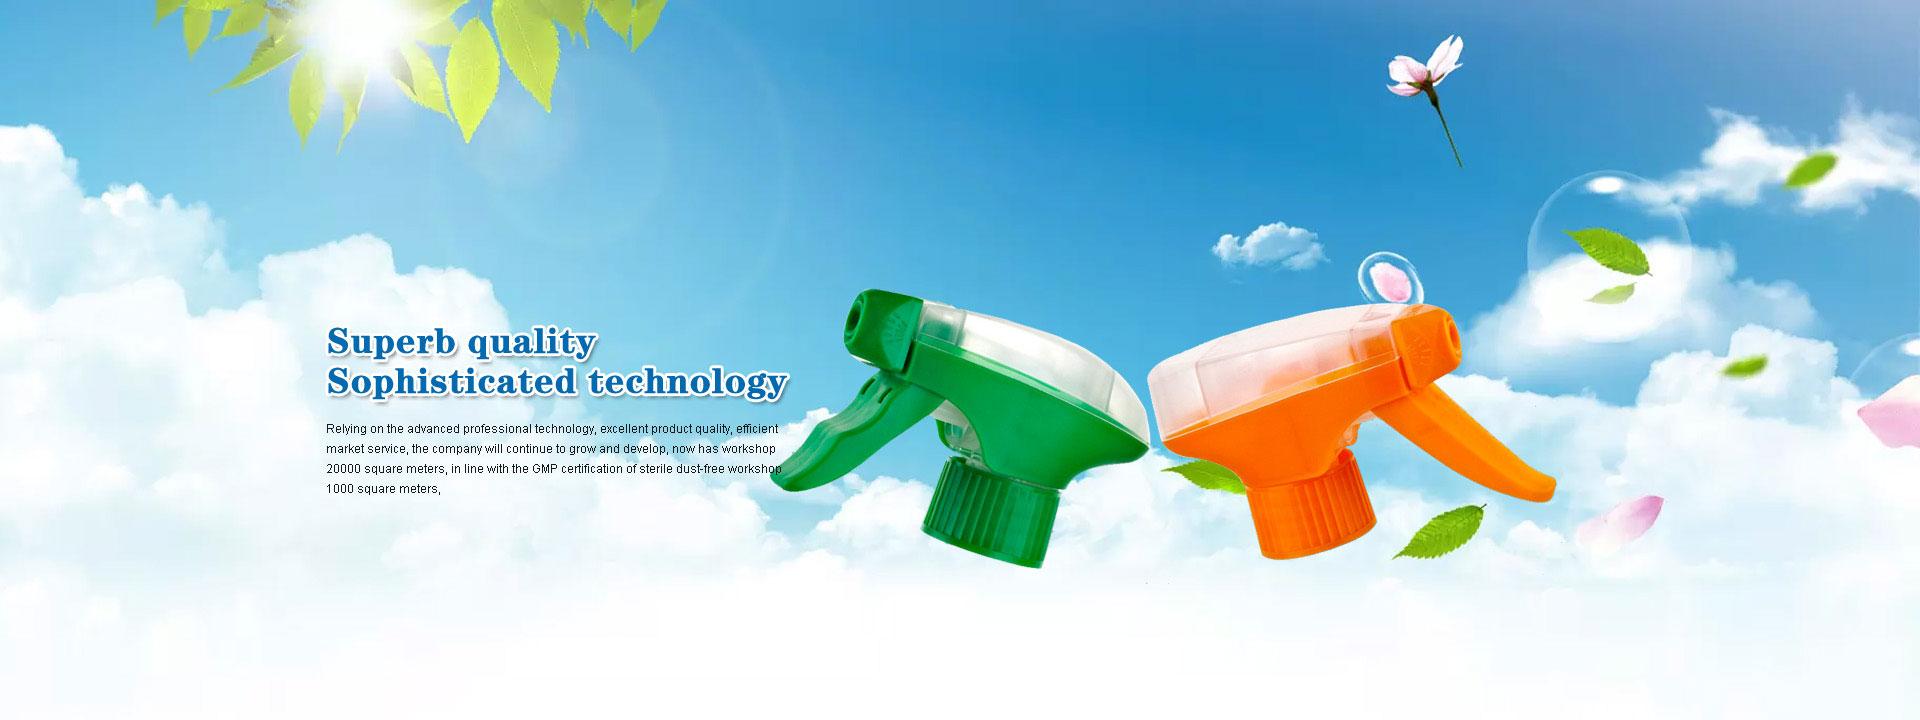 Shunlong Sprayer